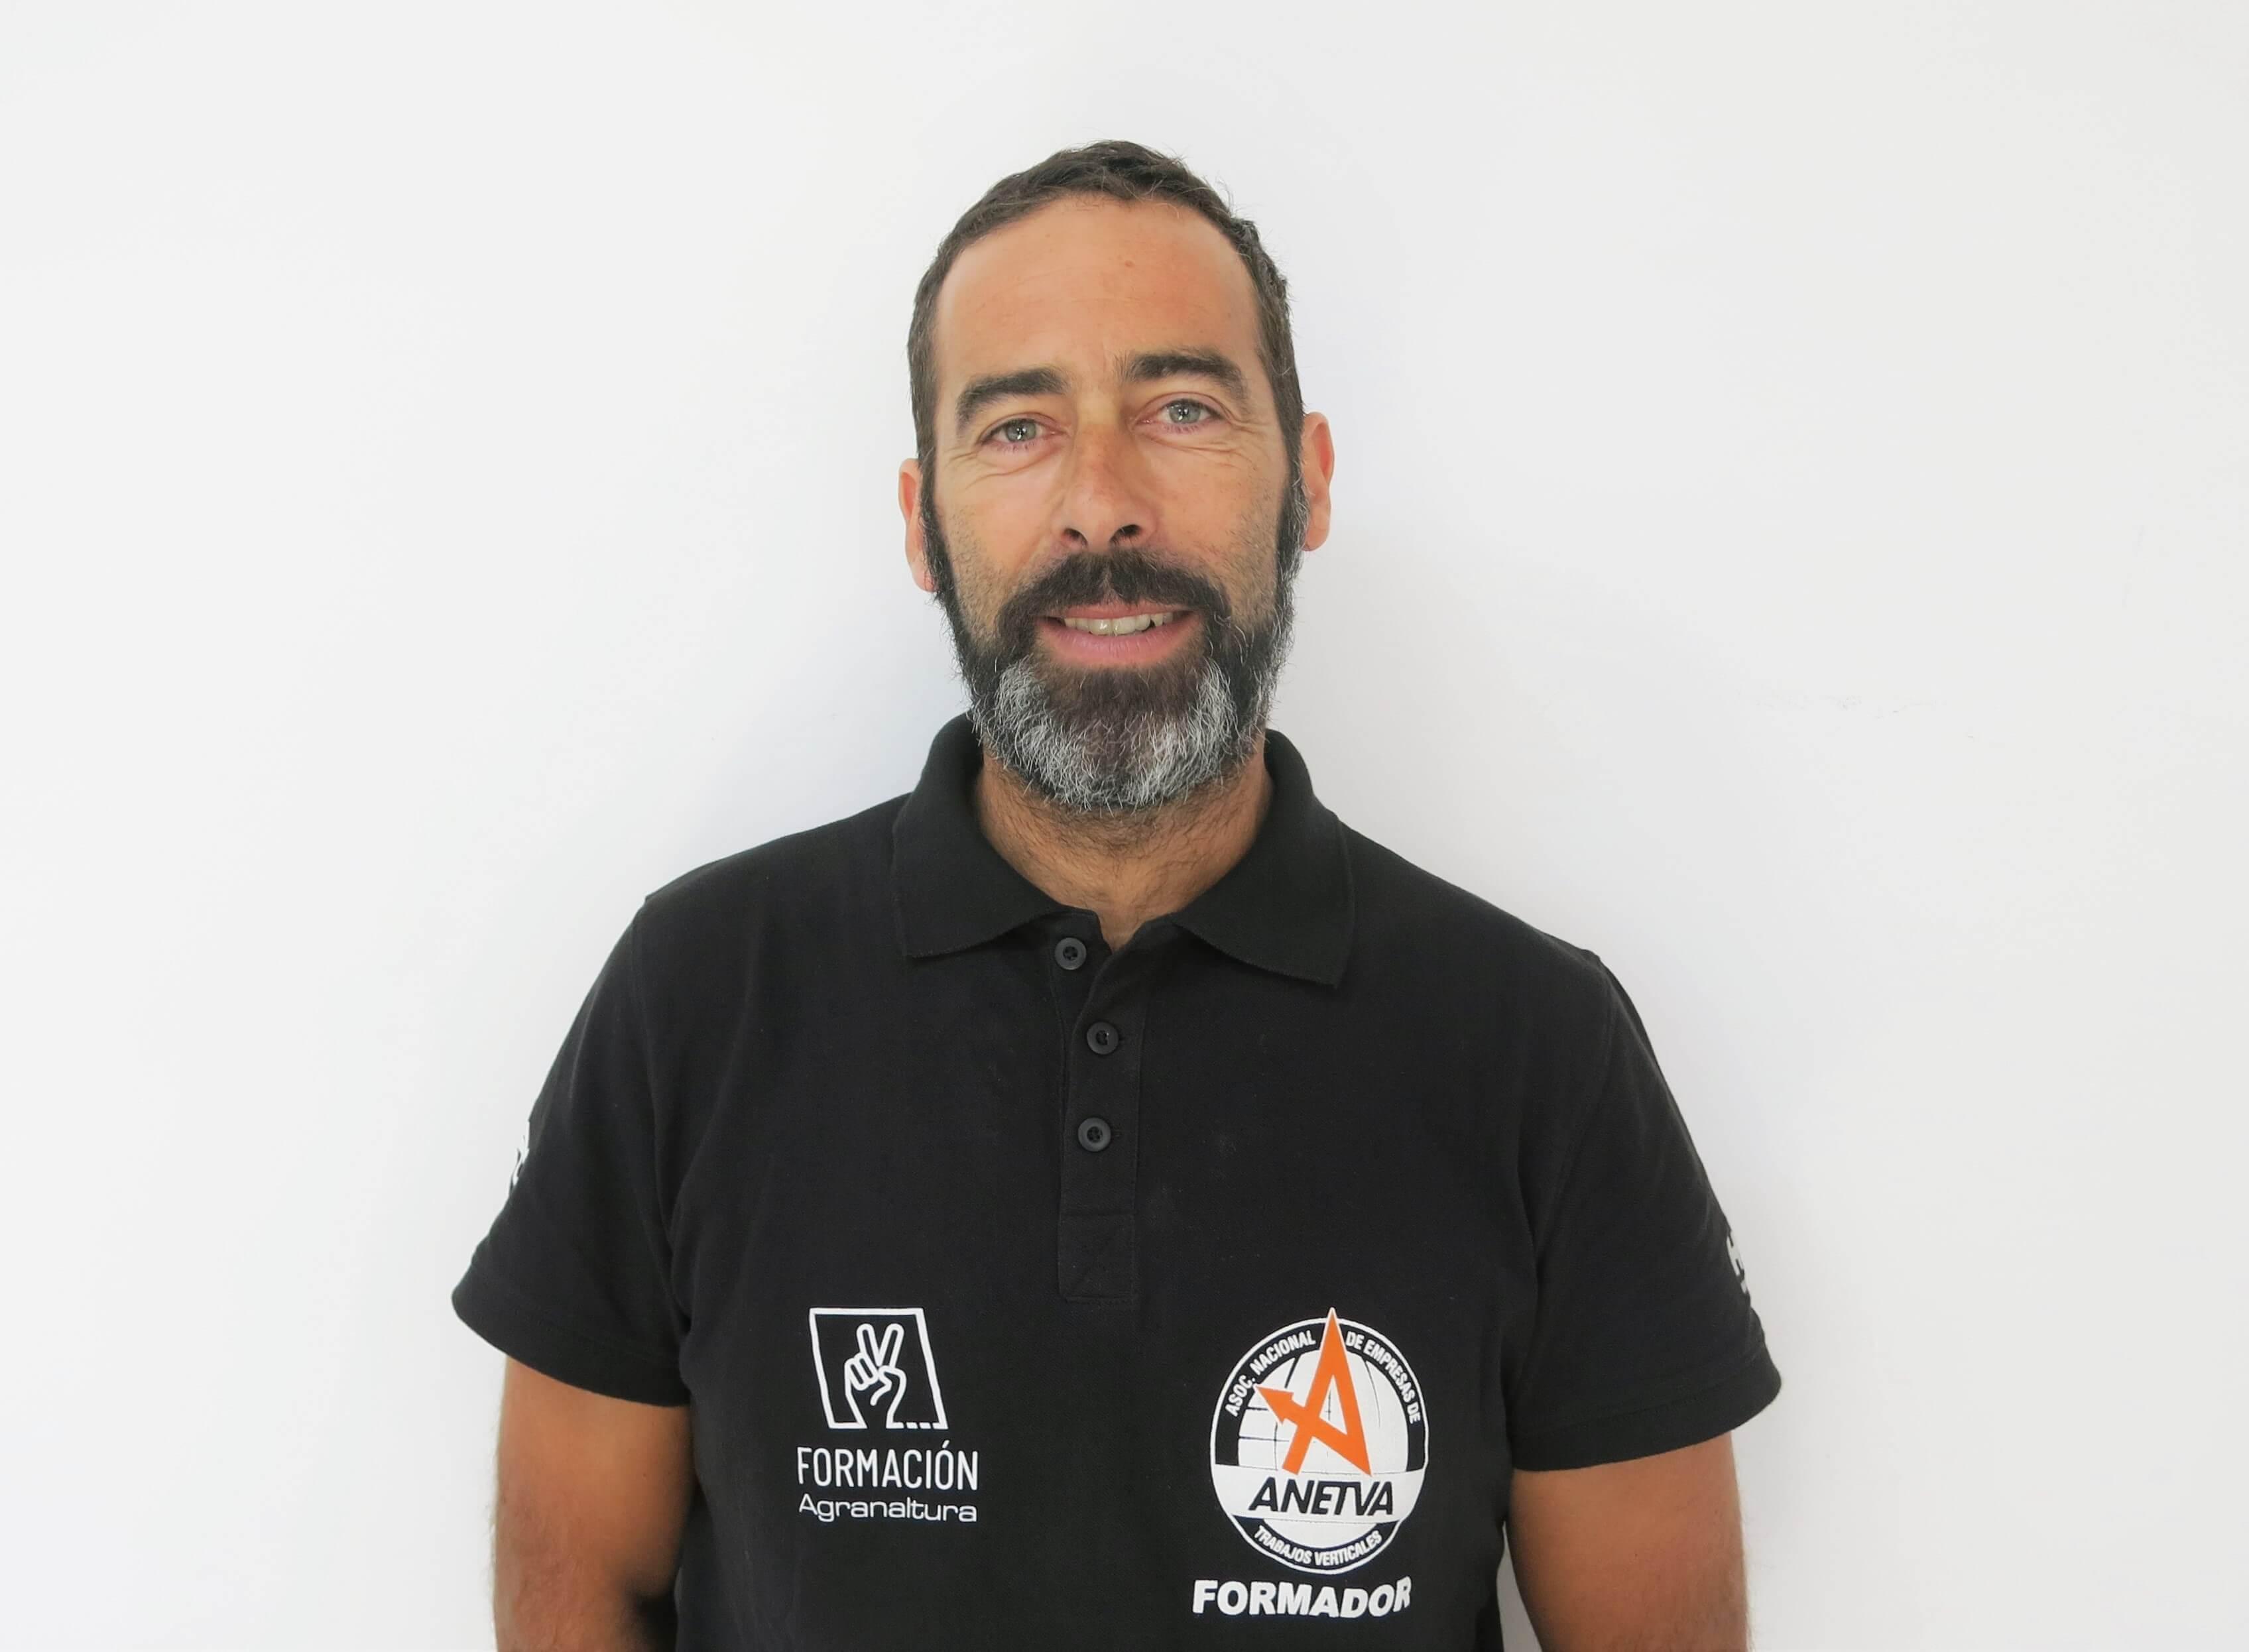 Sergio Fernández Julían